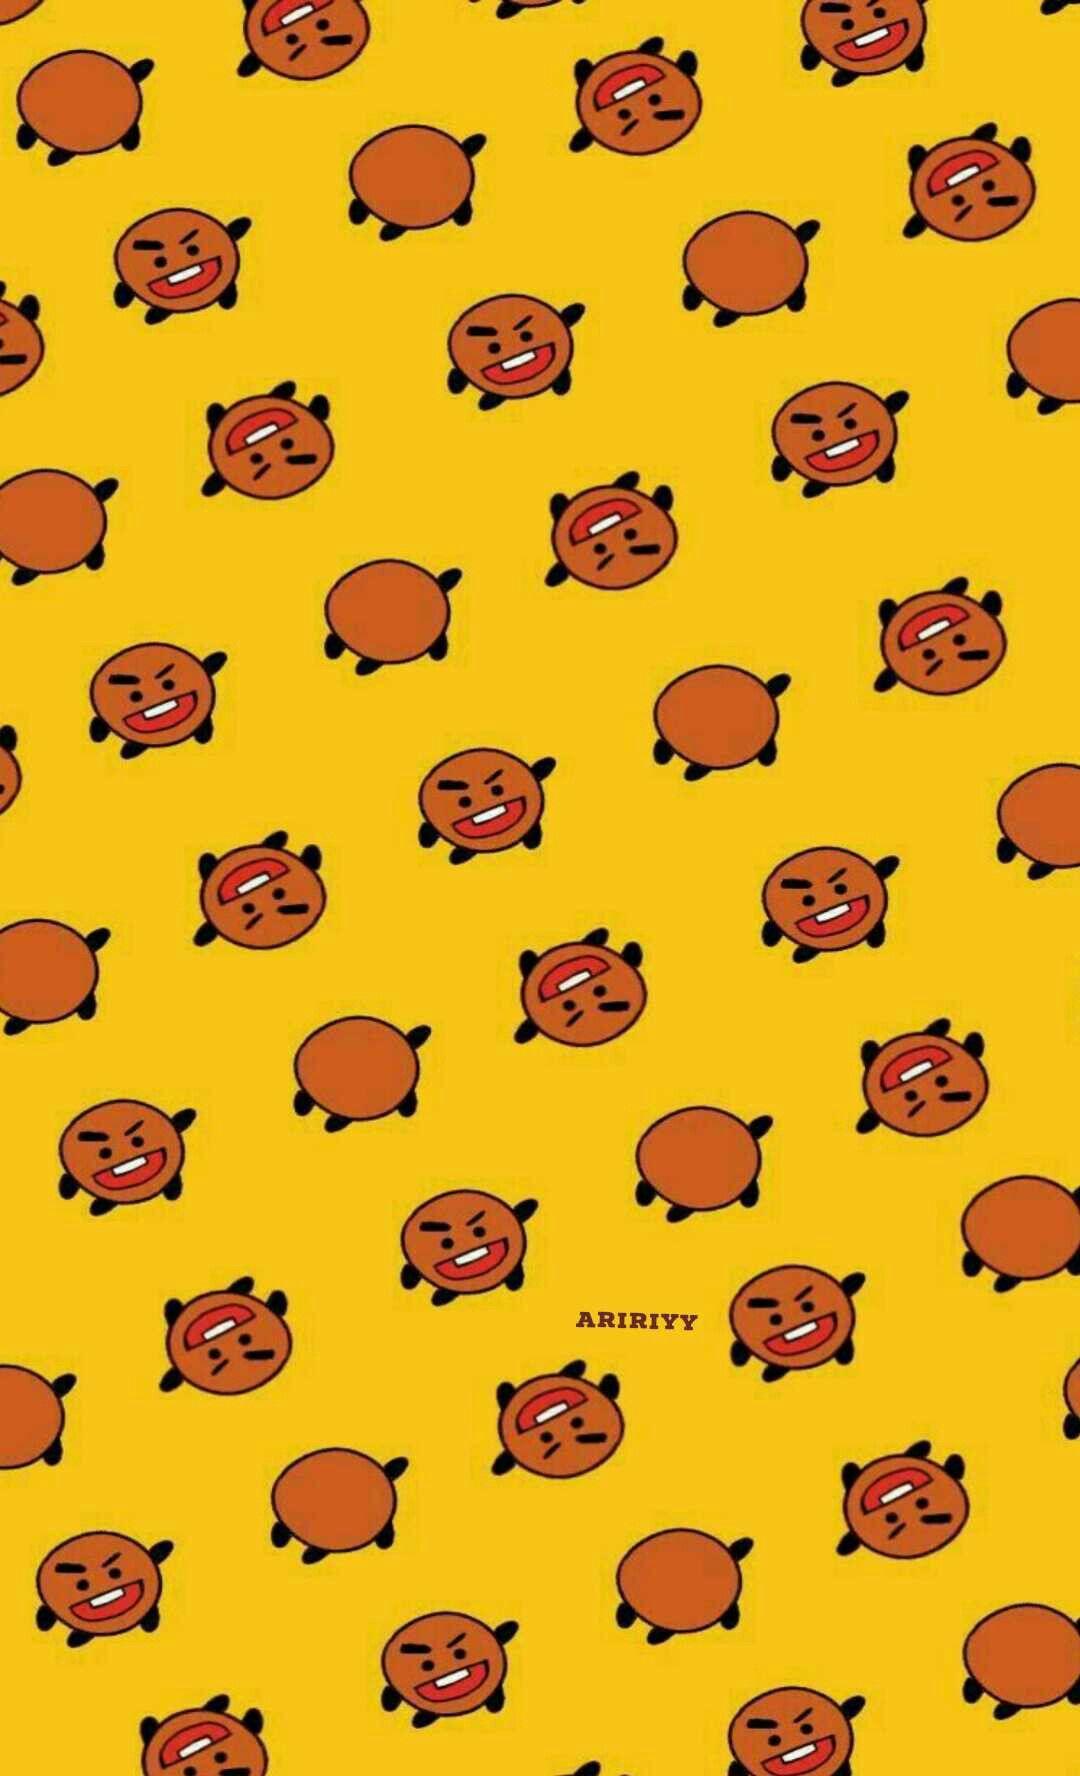 ARiRiyy § pinterest《 Bts Bt21 Wallpapers shooky Suga